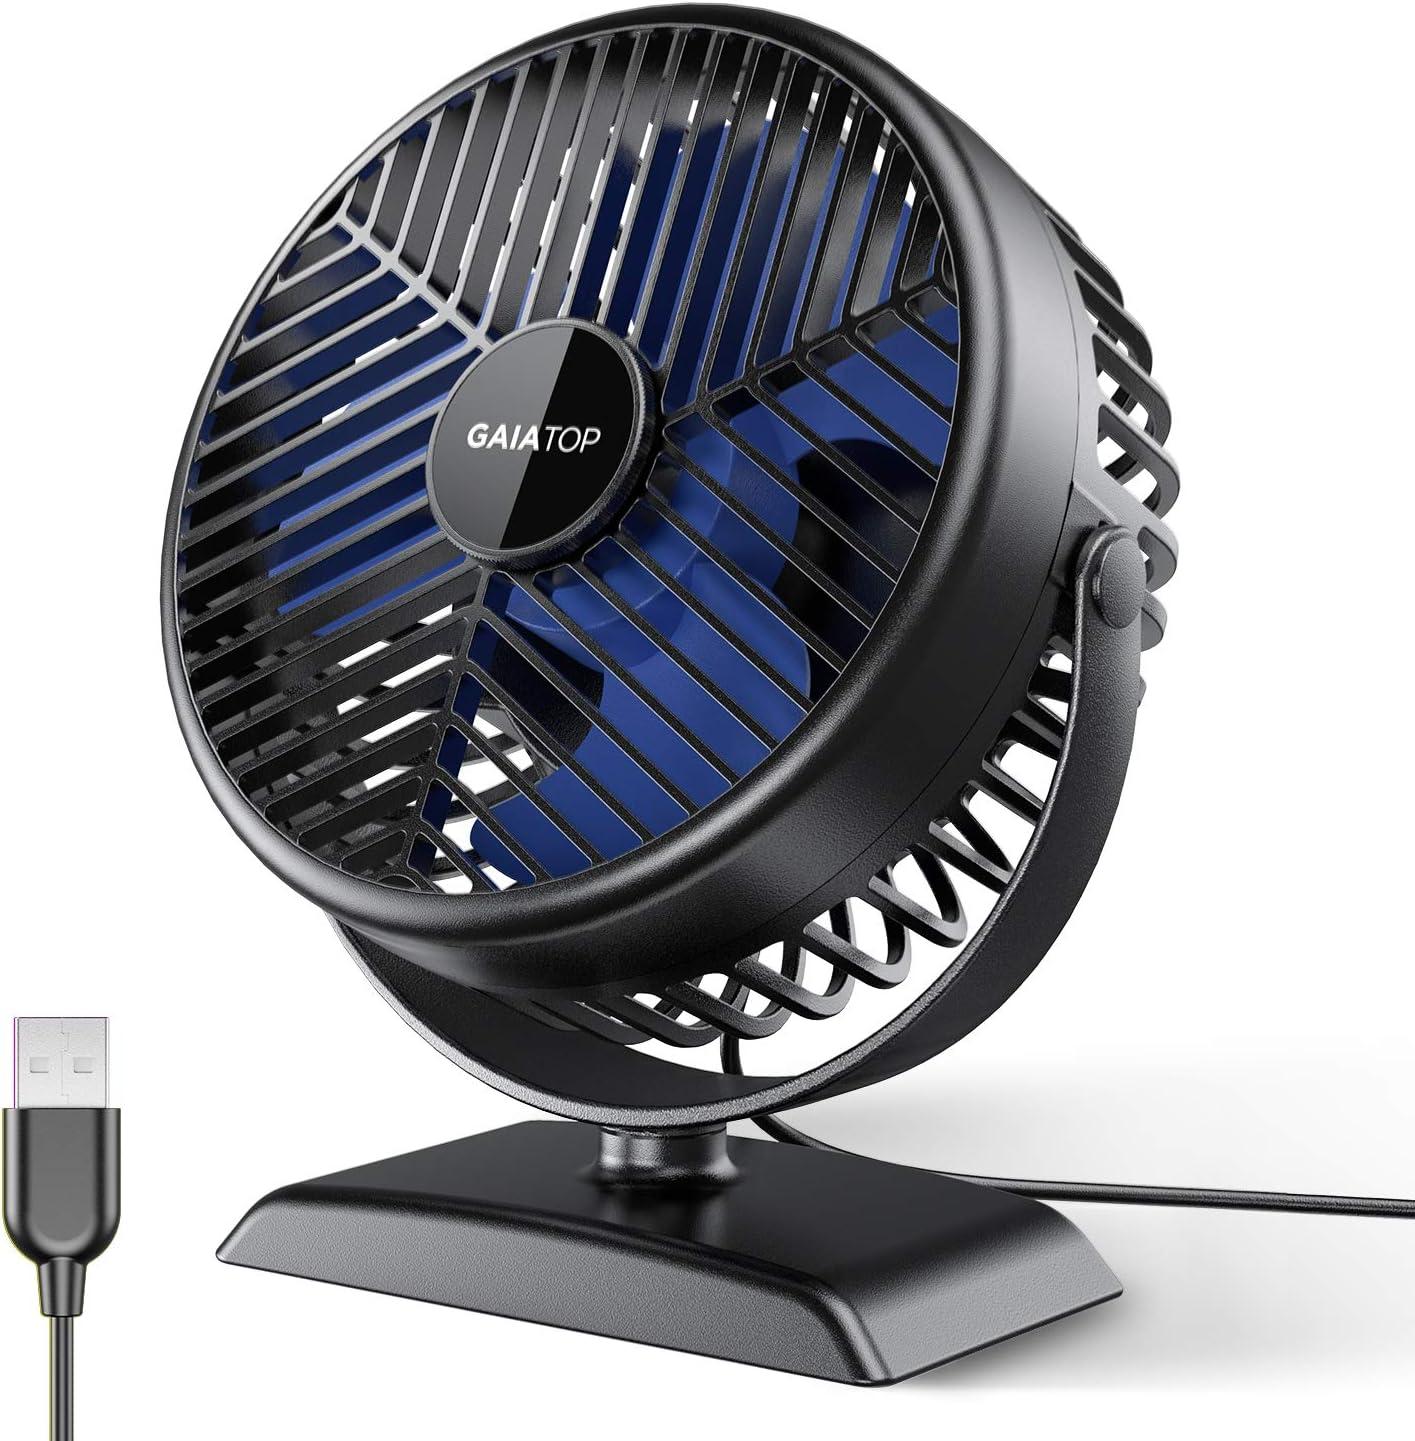 Gaiatop USB Desk Fan, Small but Powerful, Portable Quiet 3 Speeds Wind Desktop Personal Fan, Dual 360° Adjustment Mini Fan for Better Cooling Home Bedroom Office Car Outdoor(Black Blue)